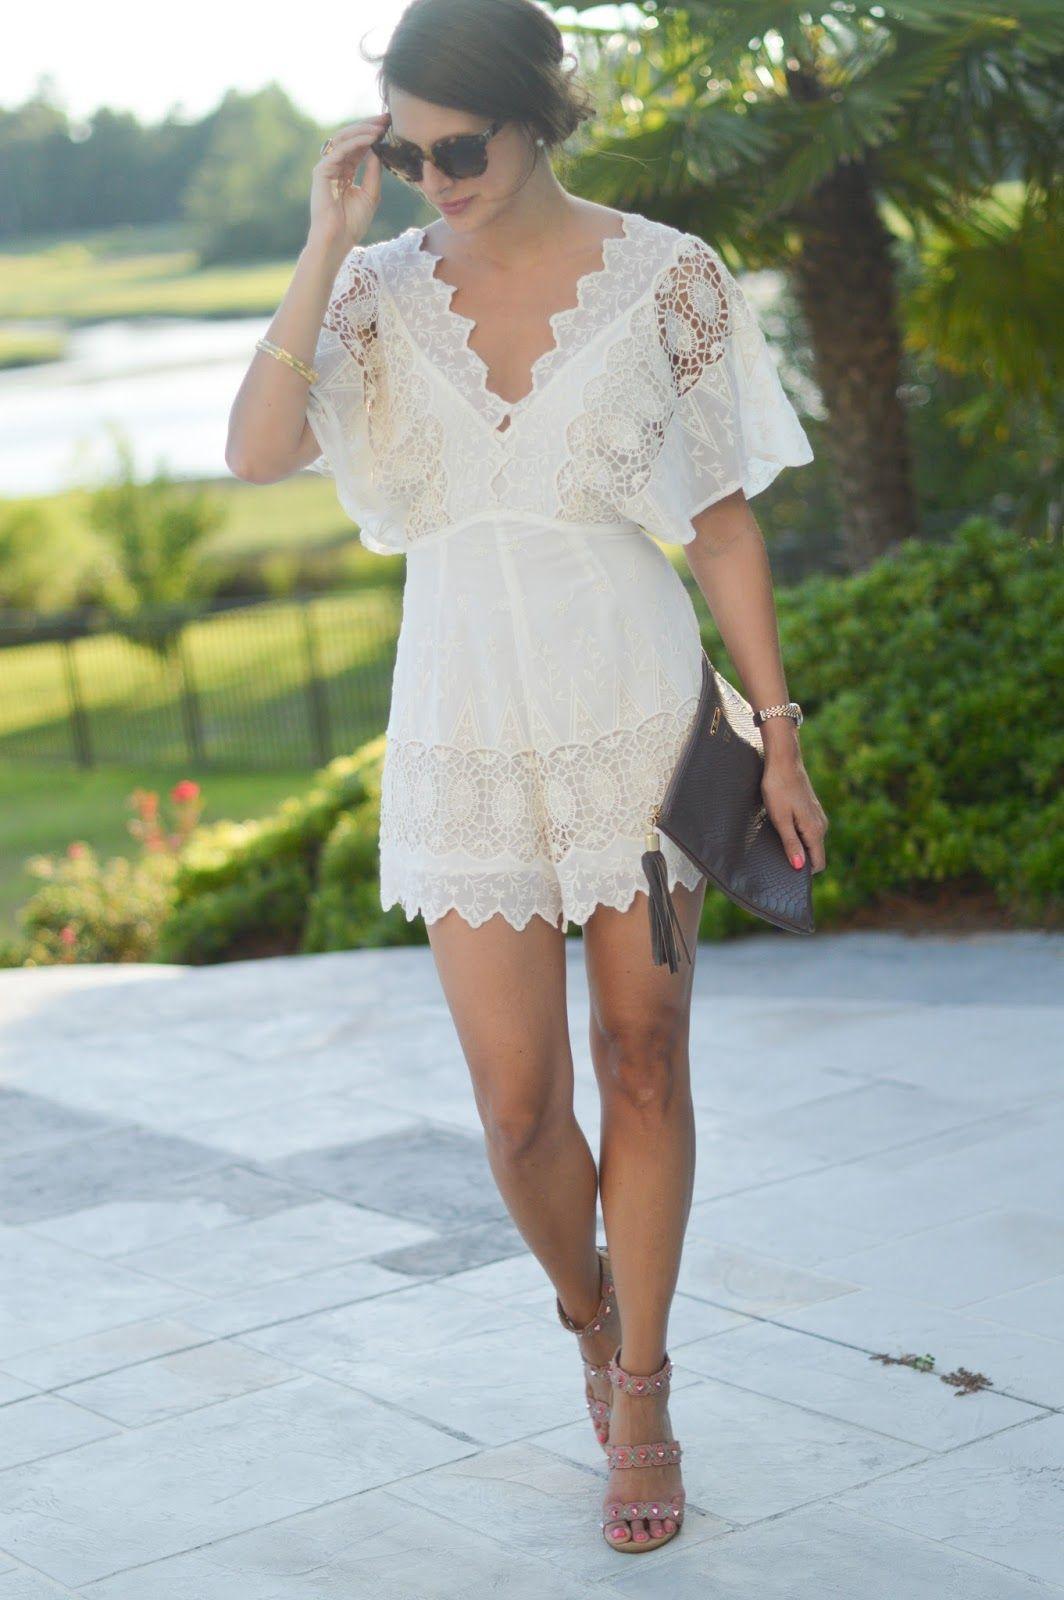 Perfect White Romper Bachelorette Outfits Bachlorette Party Outfits Bachelorette Party Outfit [ 1600 x 1064 Pixel ]